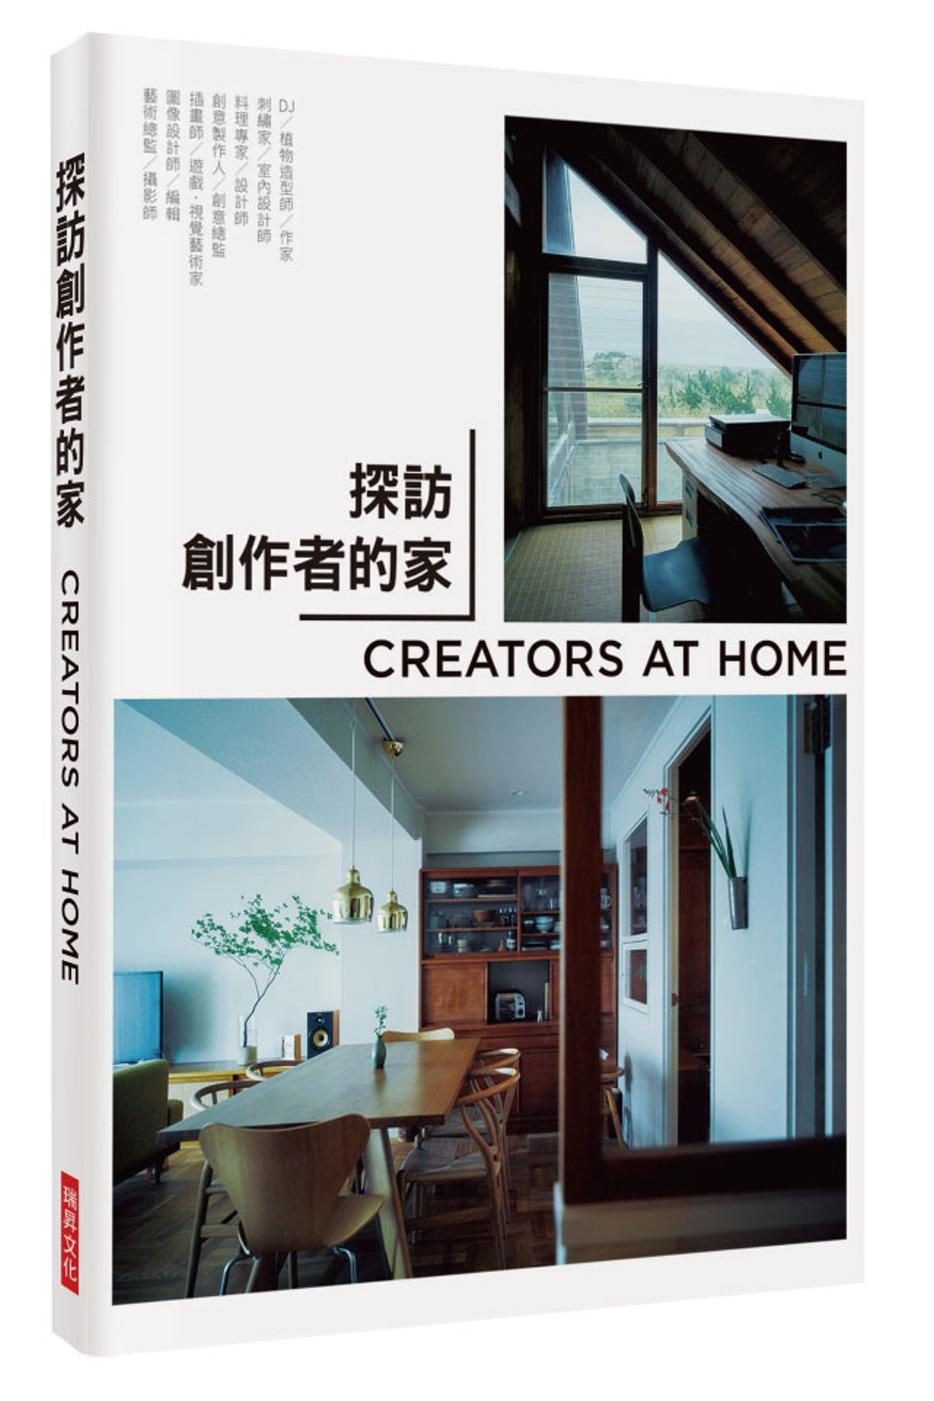 探訪創作者的家:CREATORS AT HOME